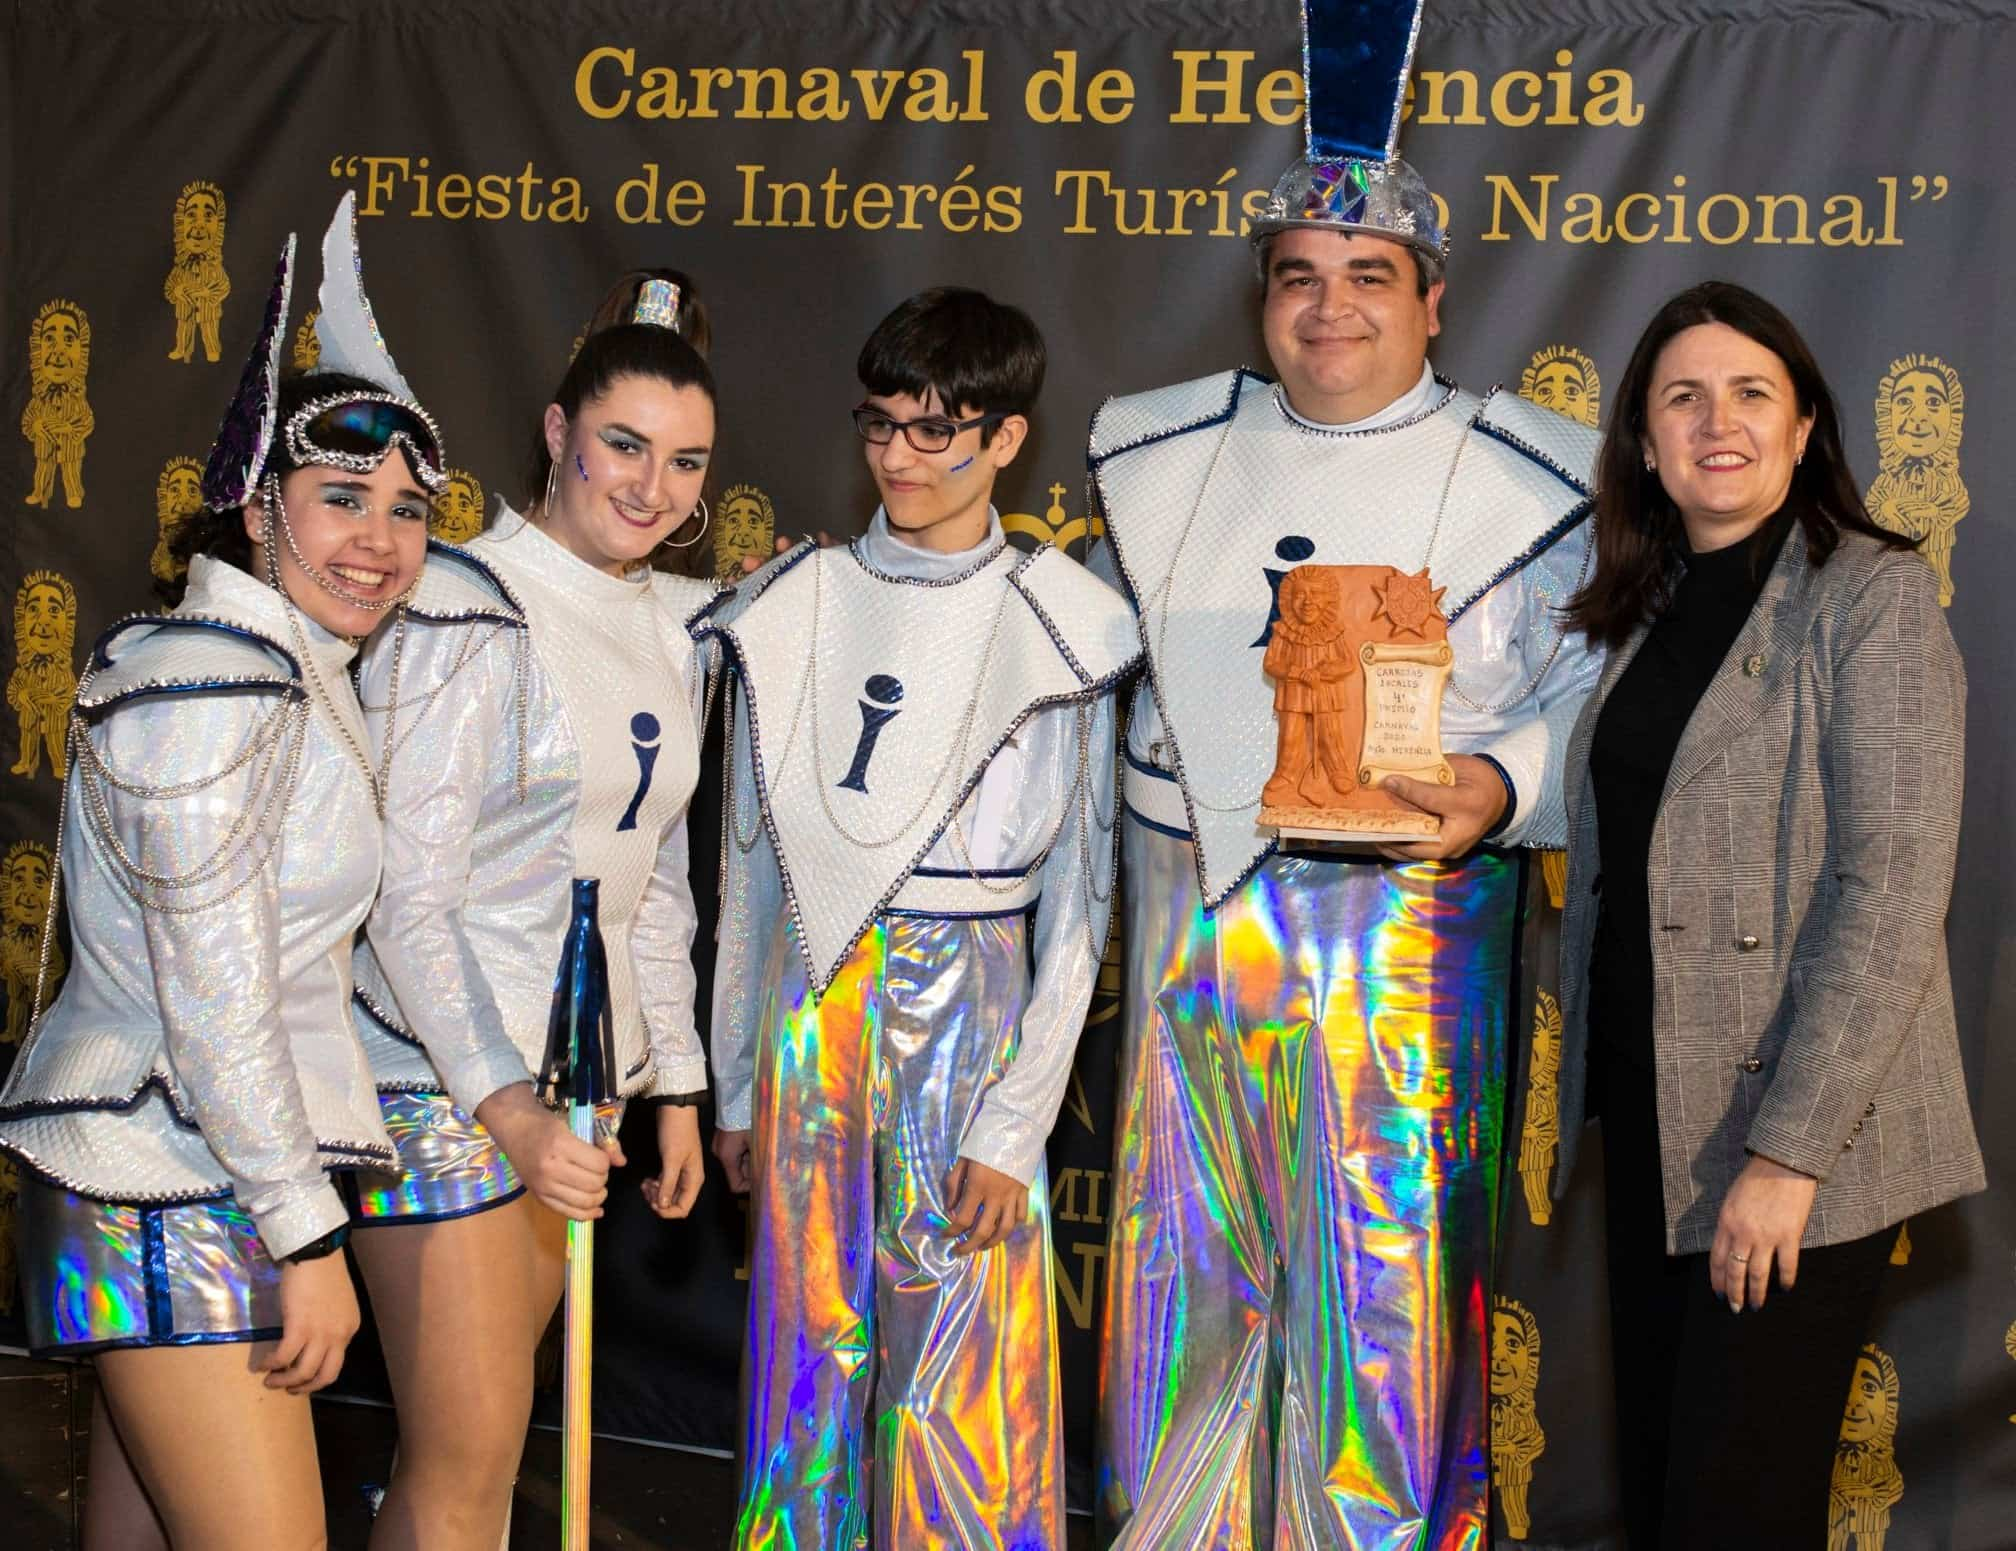 Carnaval de herencia 2020 ofertorio 143 - Selección de fotografías del Ofertorio del Carnaval de Herencia